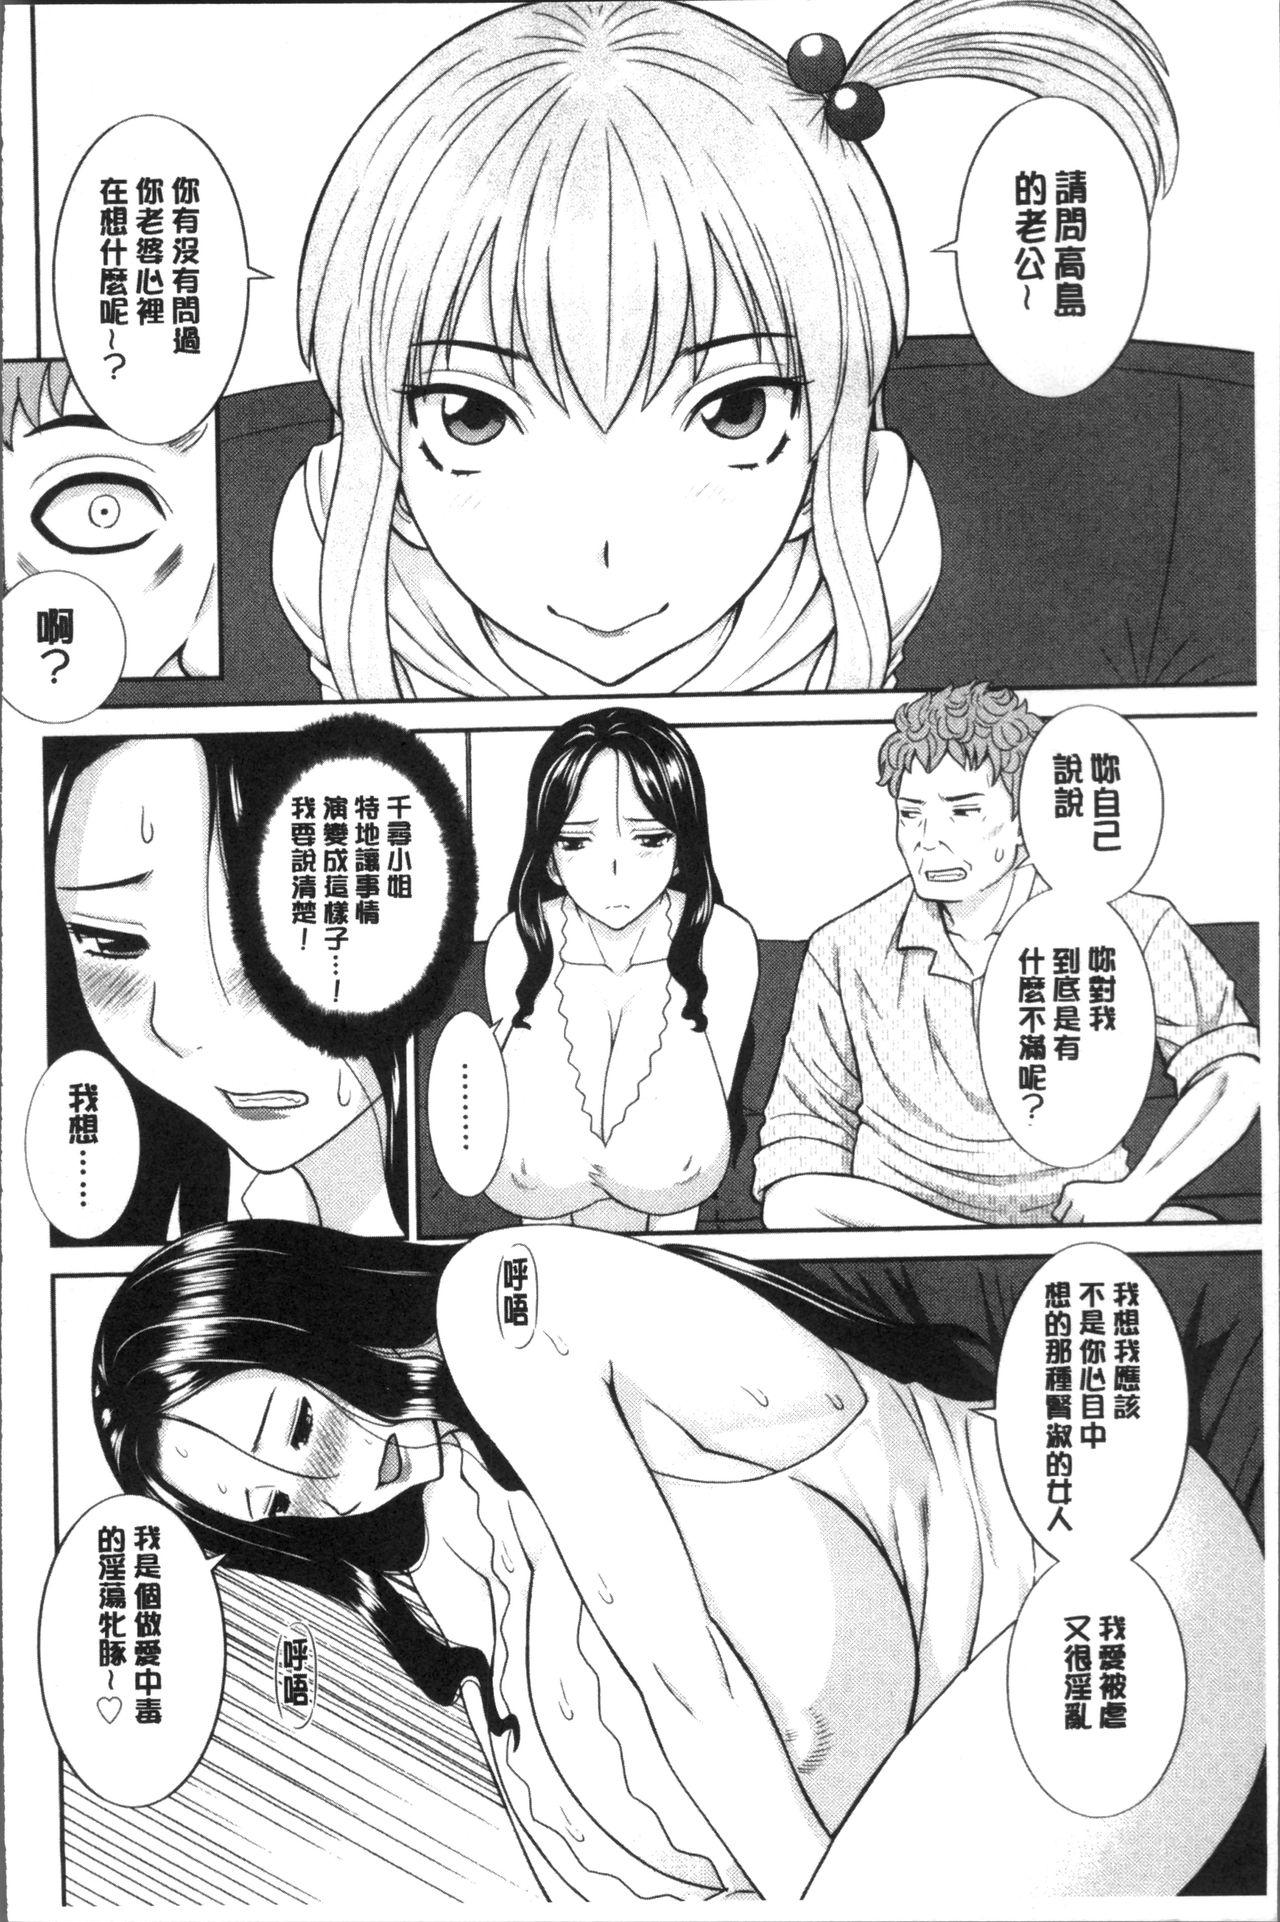 [Kawamori Misaki] Innyuu Shufu no Futei Ganbou - Oku-san to Kanojo to 2 | 淫乳主婦的不貞願望 和人妻也和女友❤2 [Chinese] 137